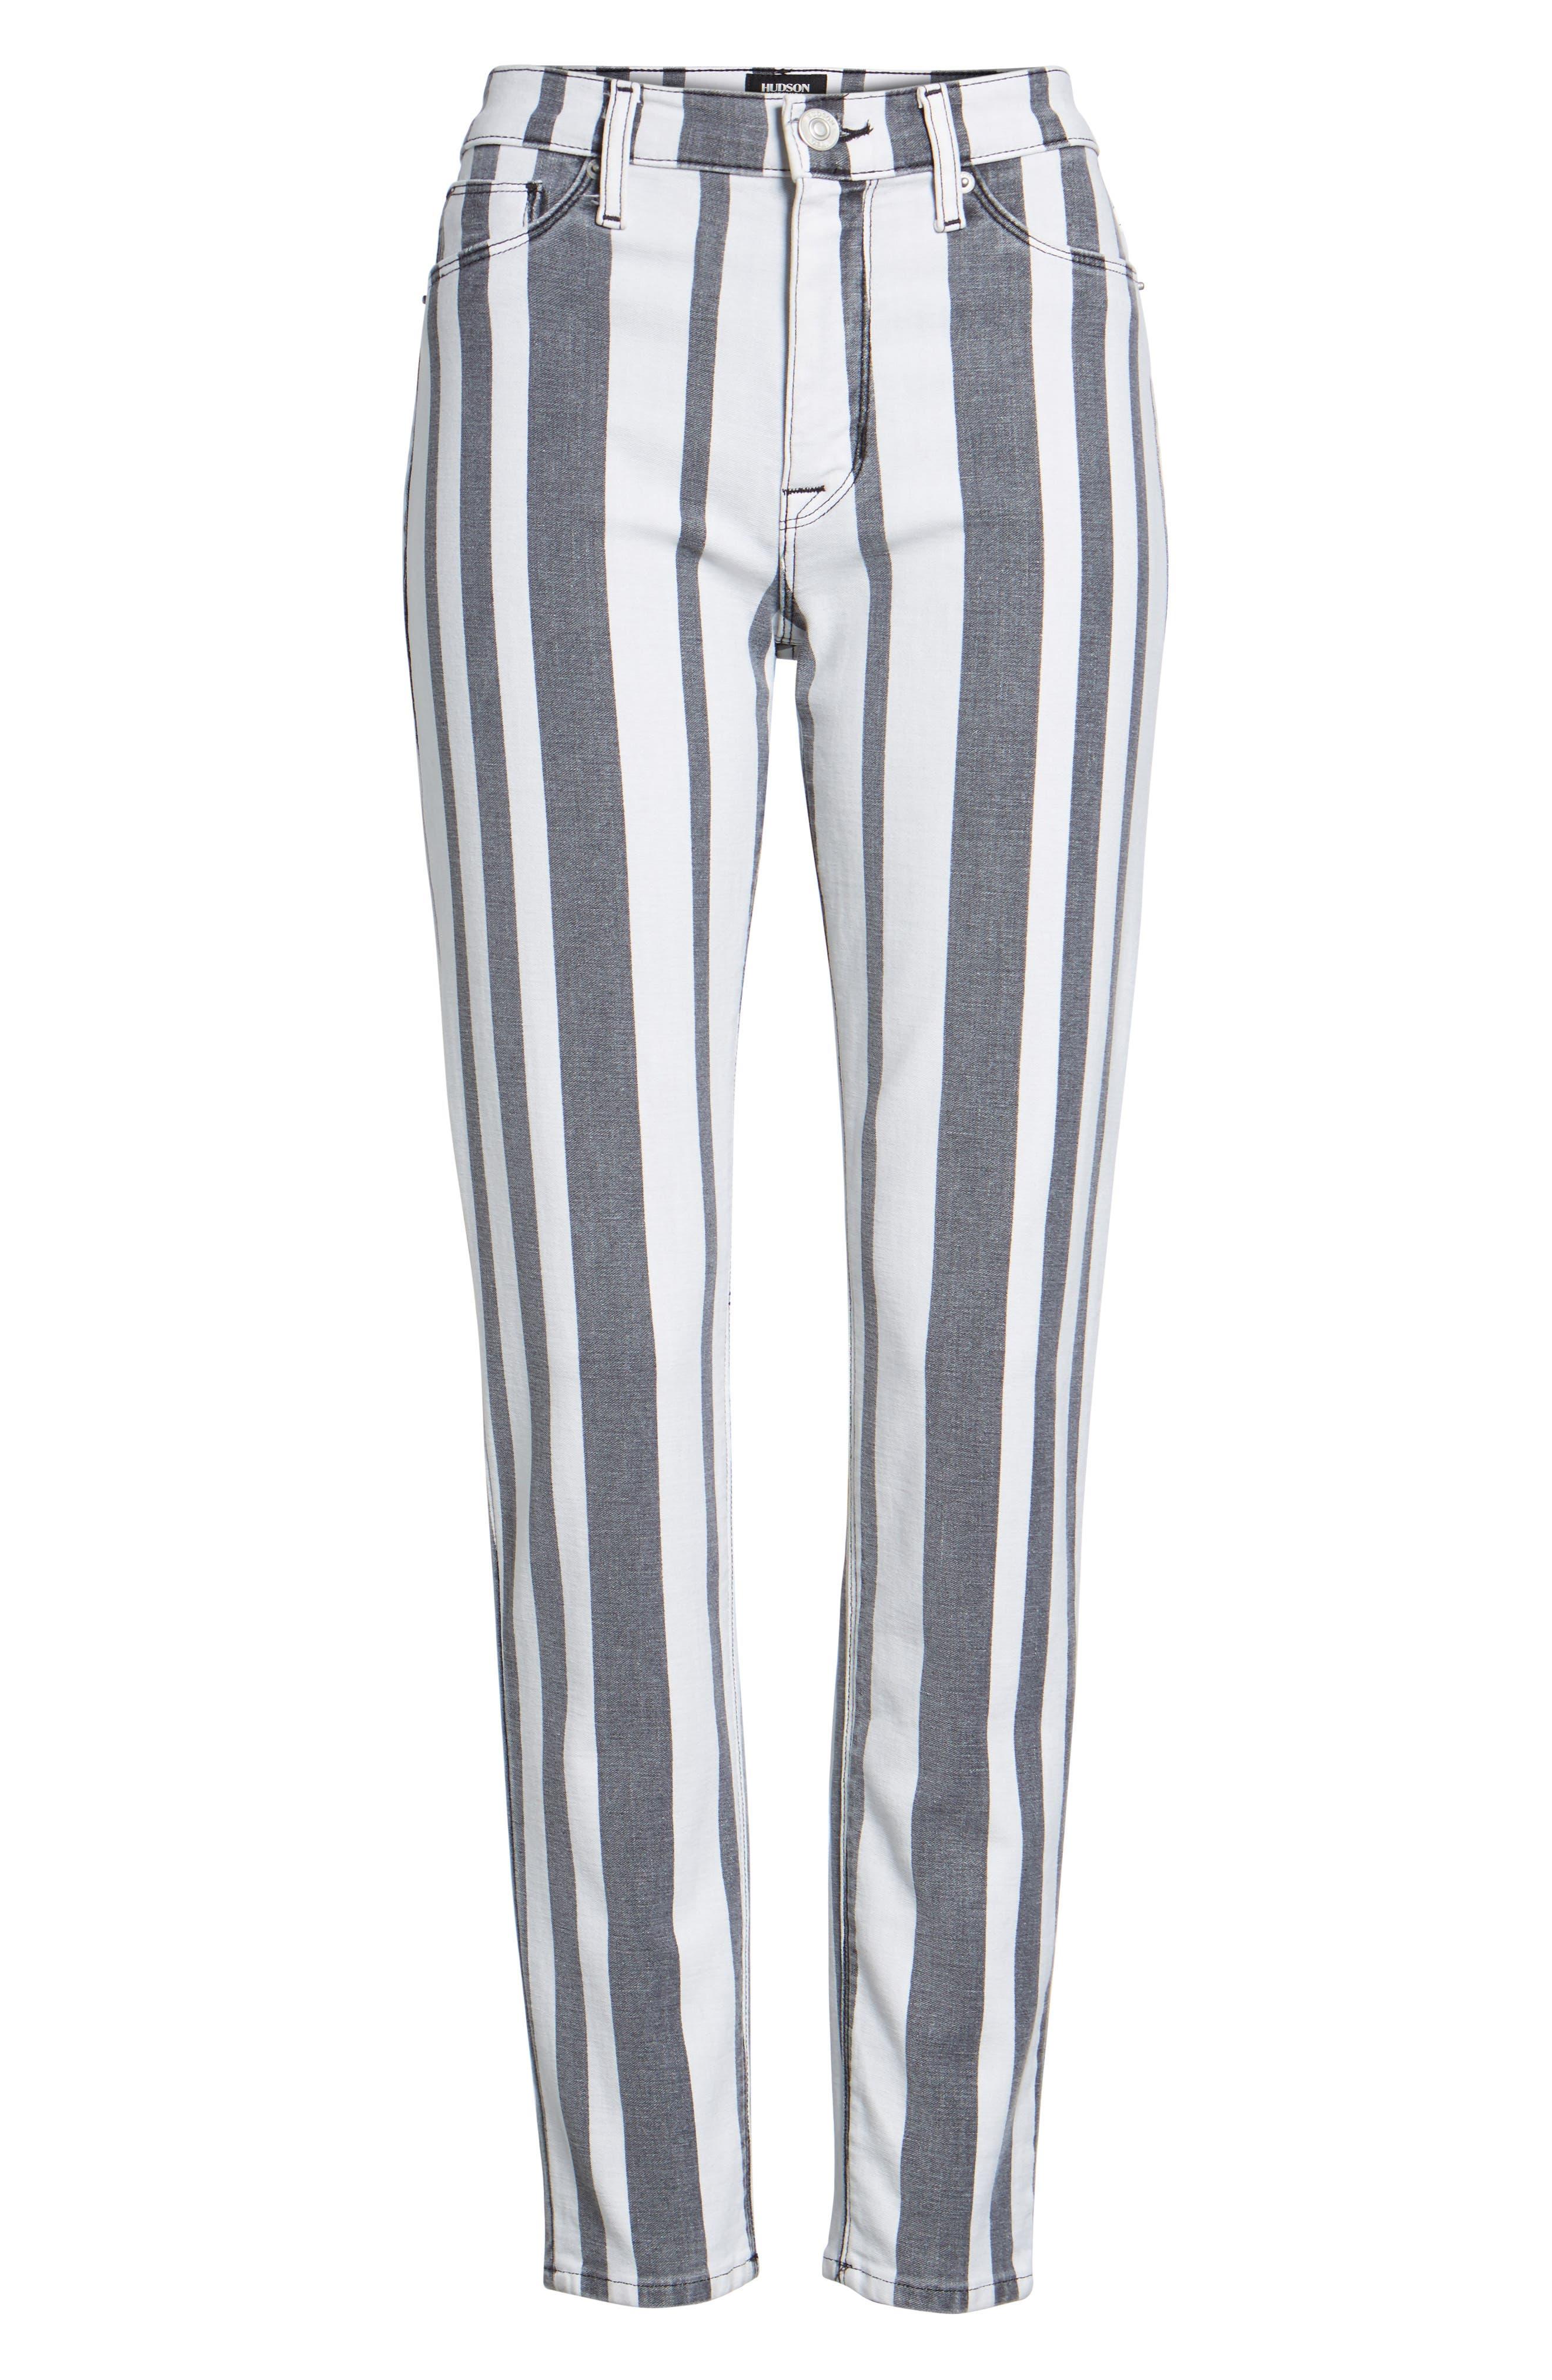 Barbara High Waist Ankle Super Skinny Jeans,                             Alternate thumbnail 6, color,                             Undertaking